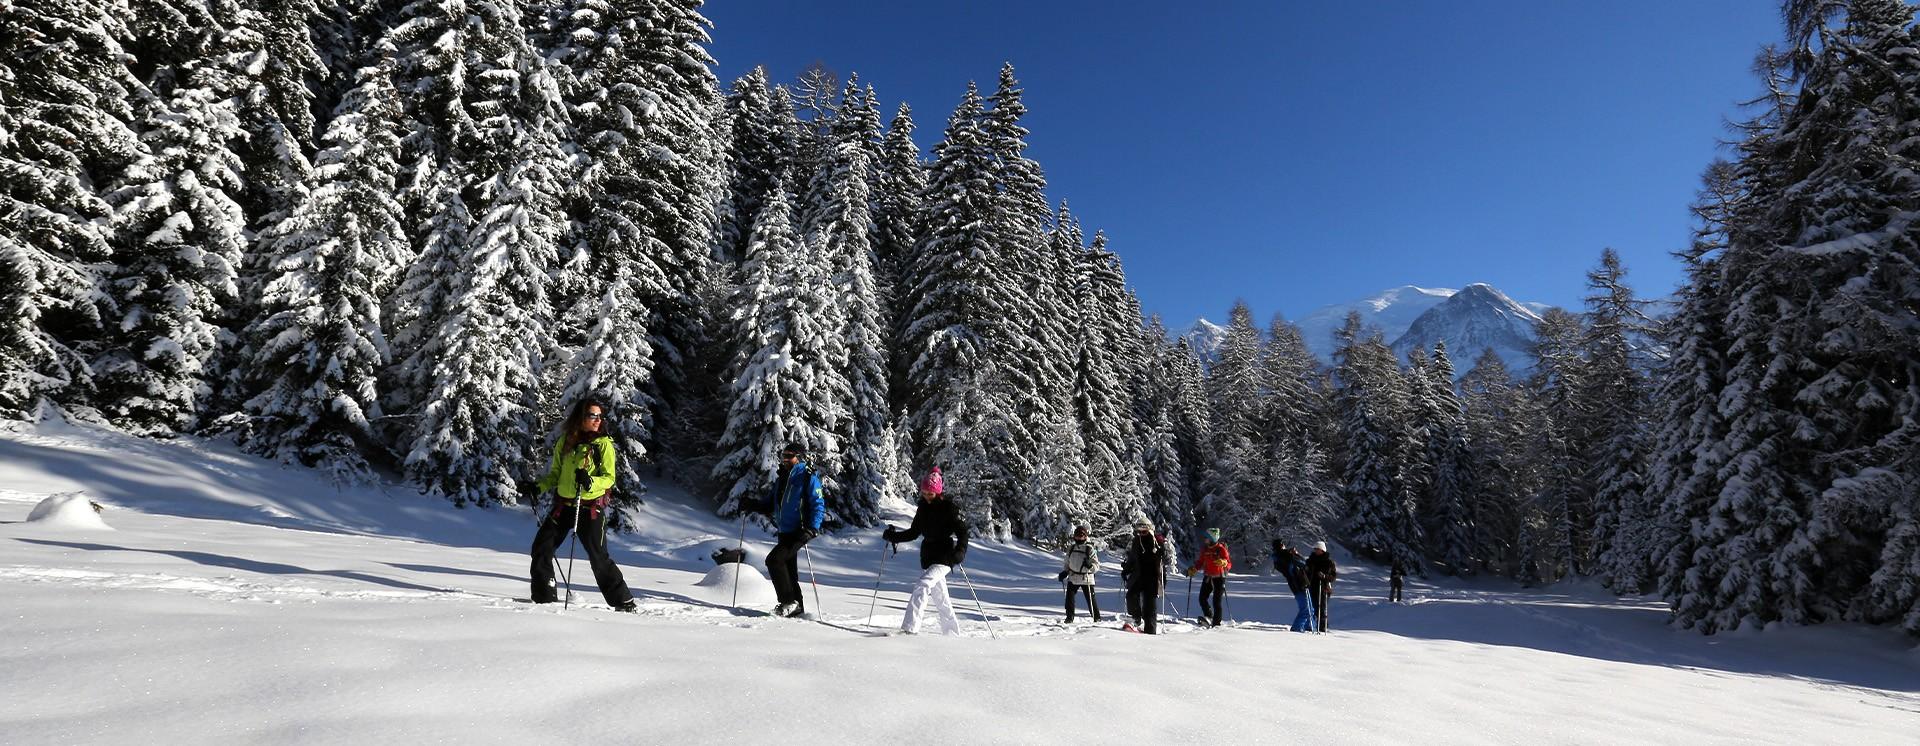 Deep escape, chamonix - winter and summer activities